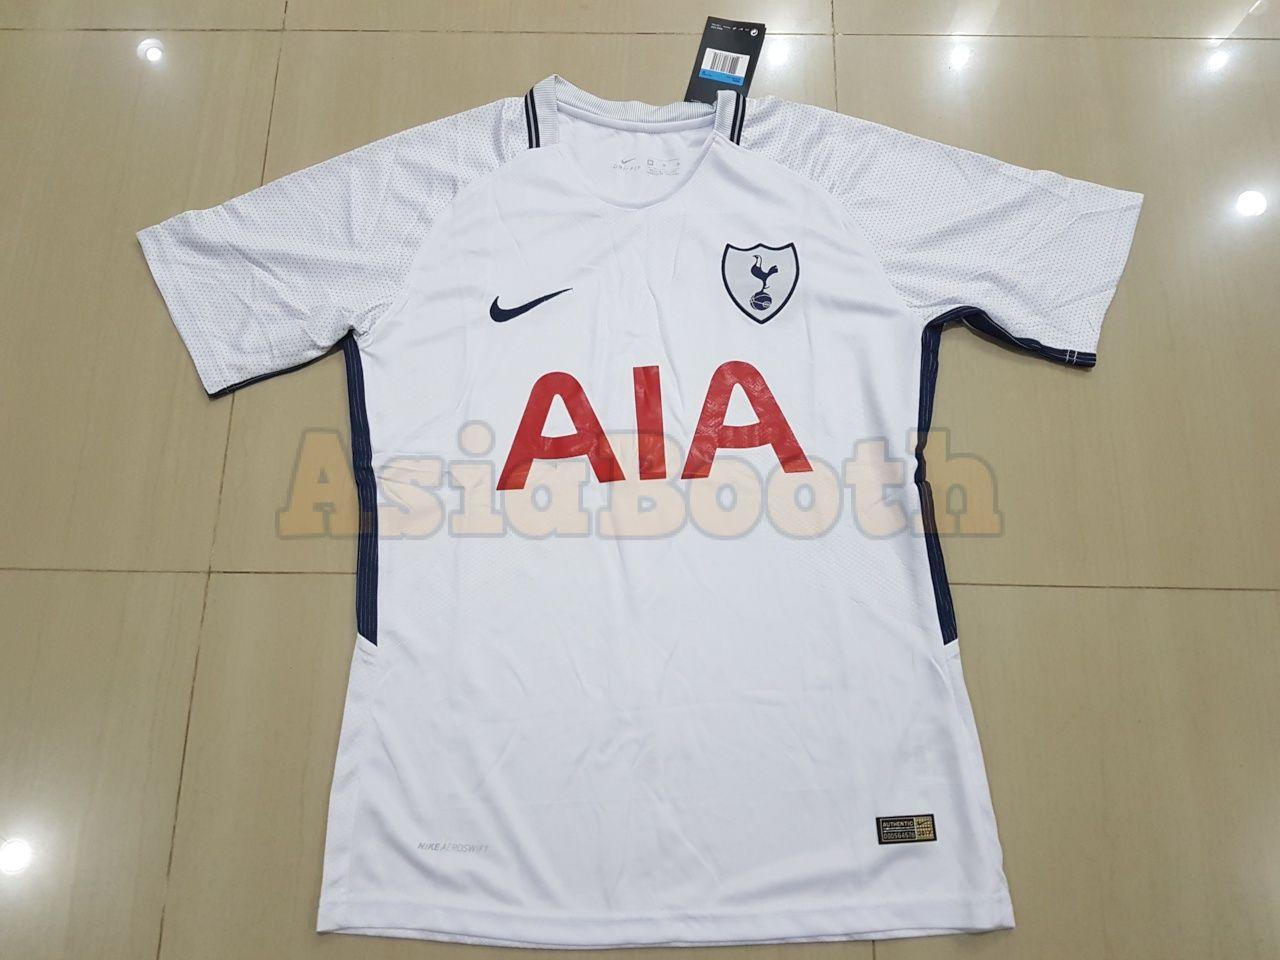 77f4005e601 2017-2018 Tottenham Hotspur Home Jersey For Men (Harry Kane) - Asia ...